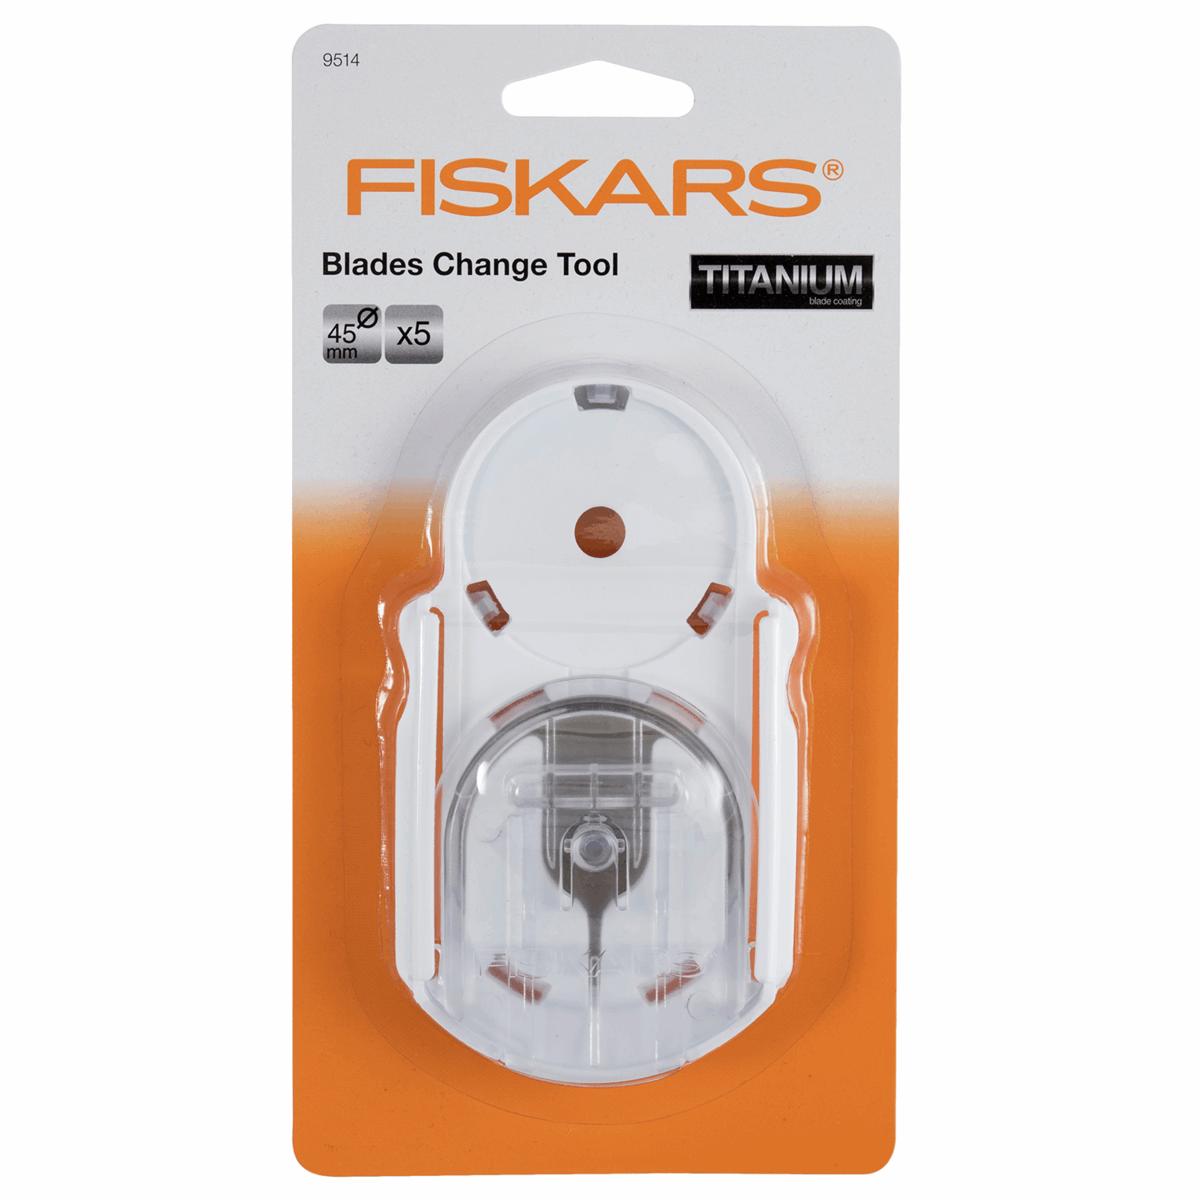 Fiskars Titanium No Touch Blade Changing Tool